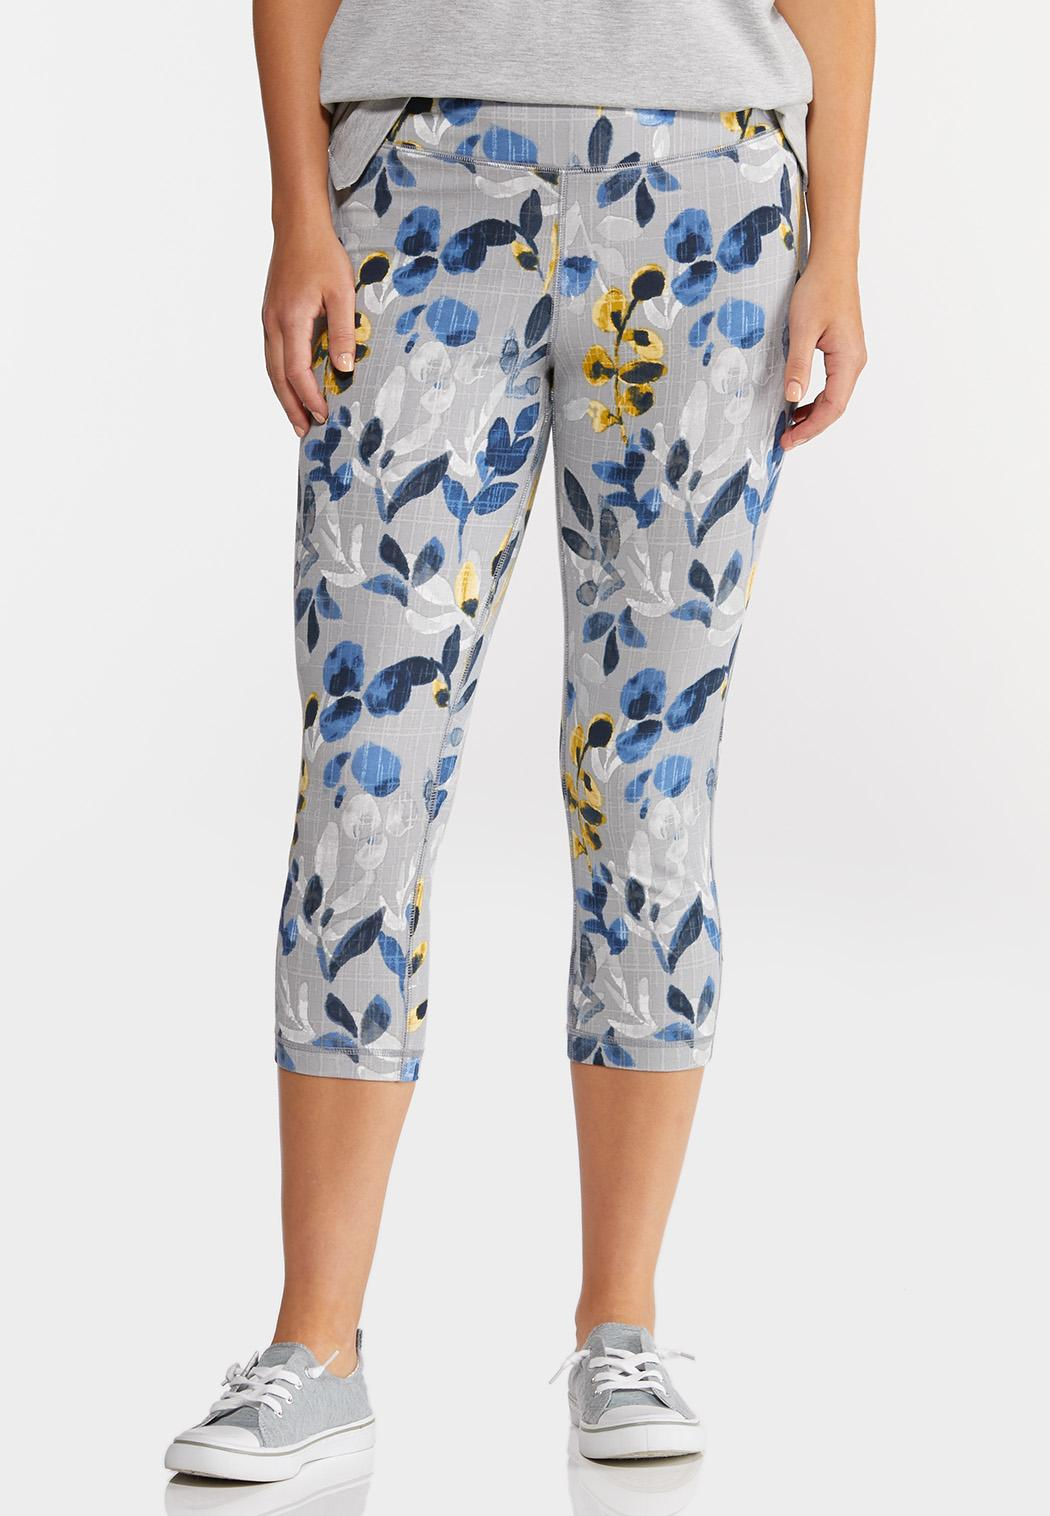 Cropped Blue Floral Leggings